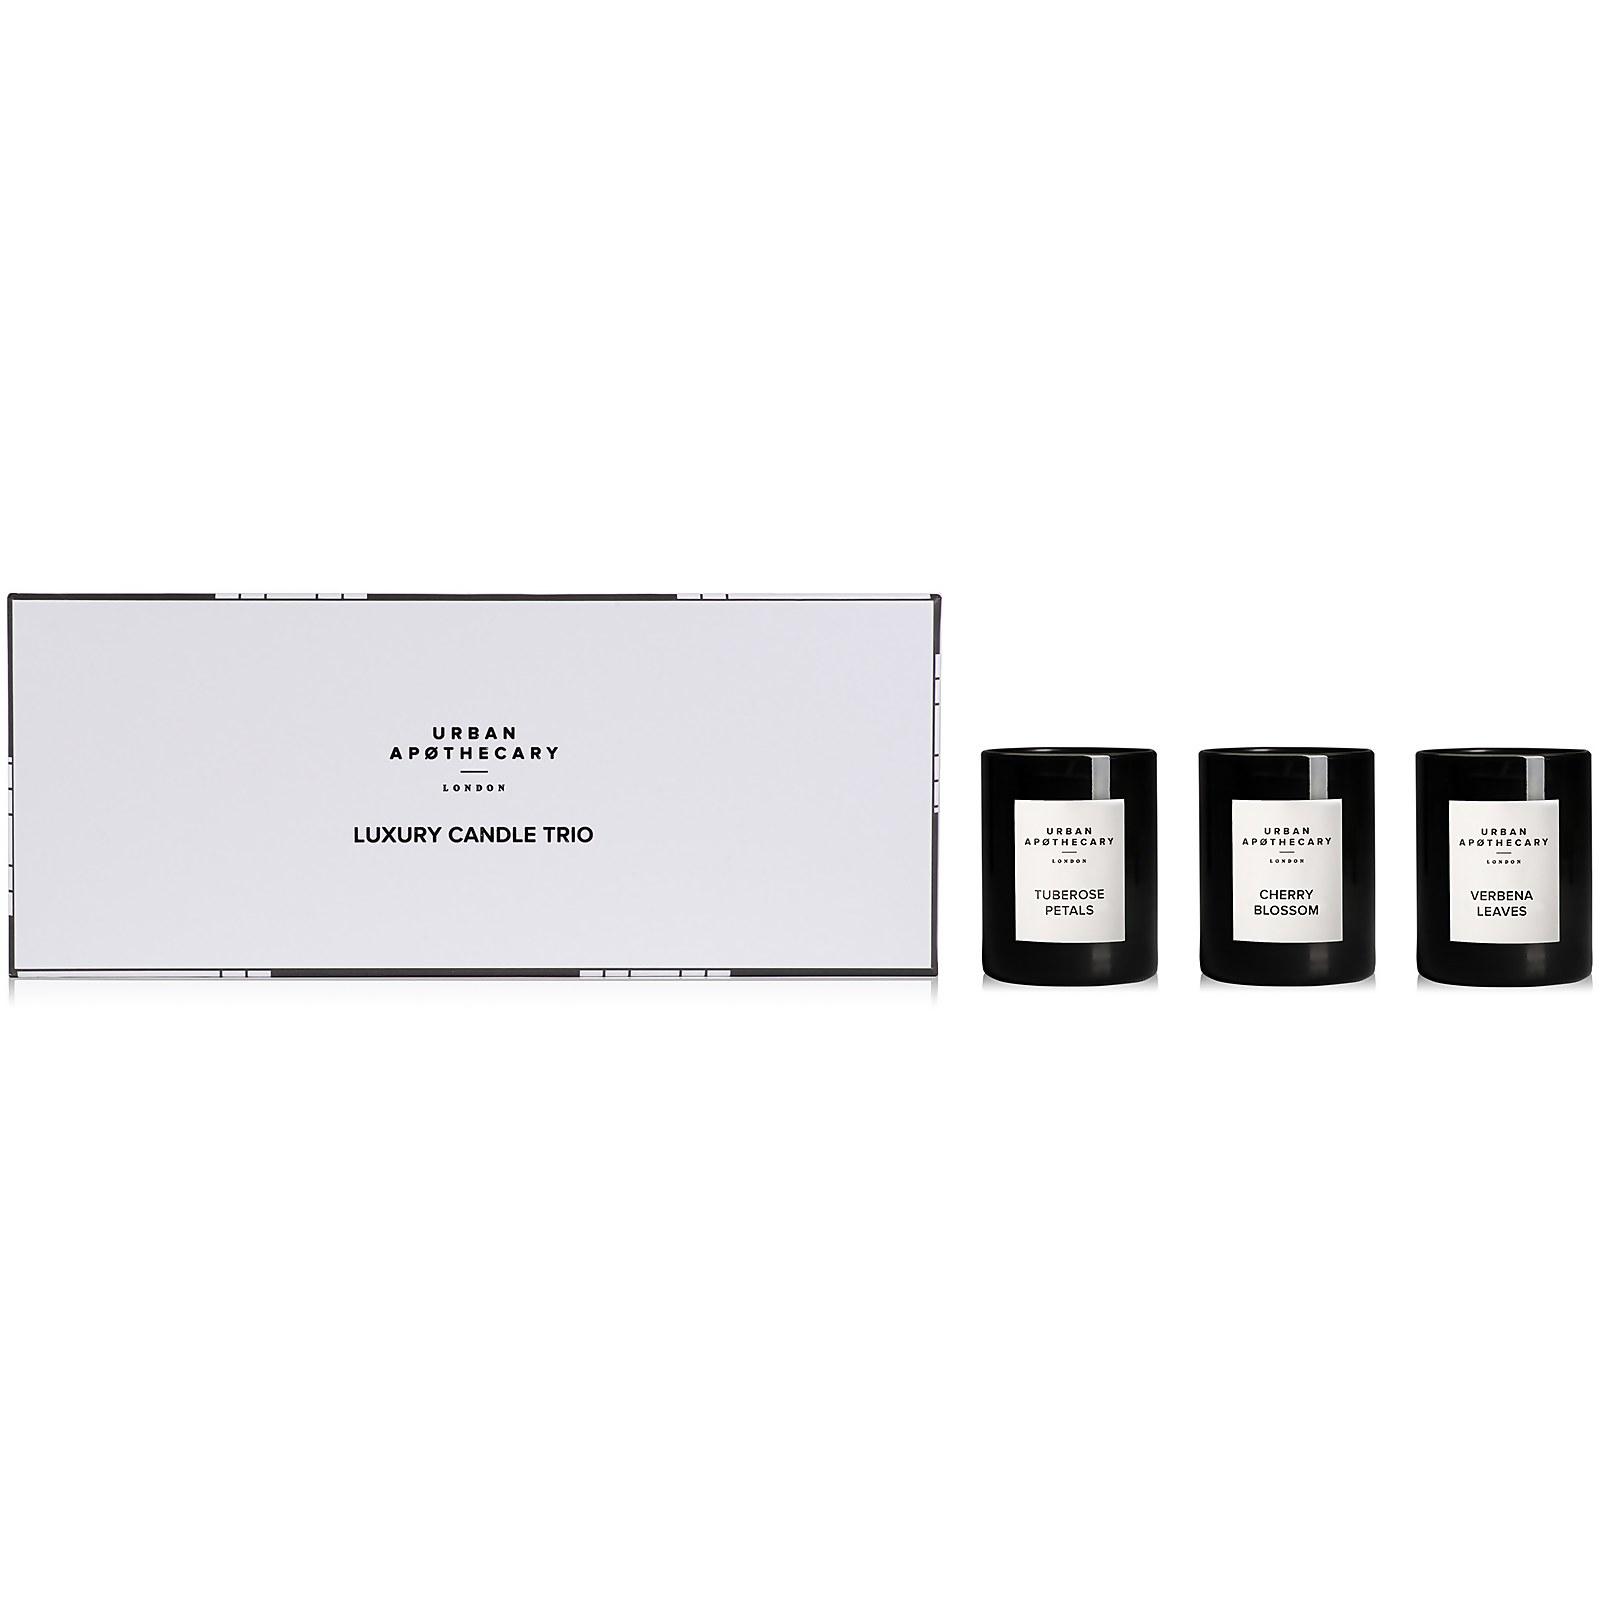 Urban Apothecary Luxury Candle Trio Gift Set - Tuberose Petals - 70g